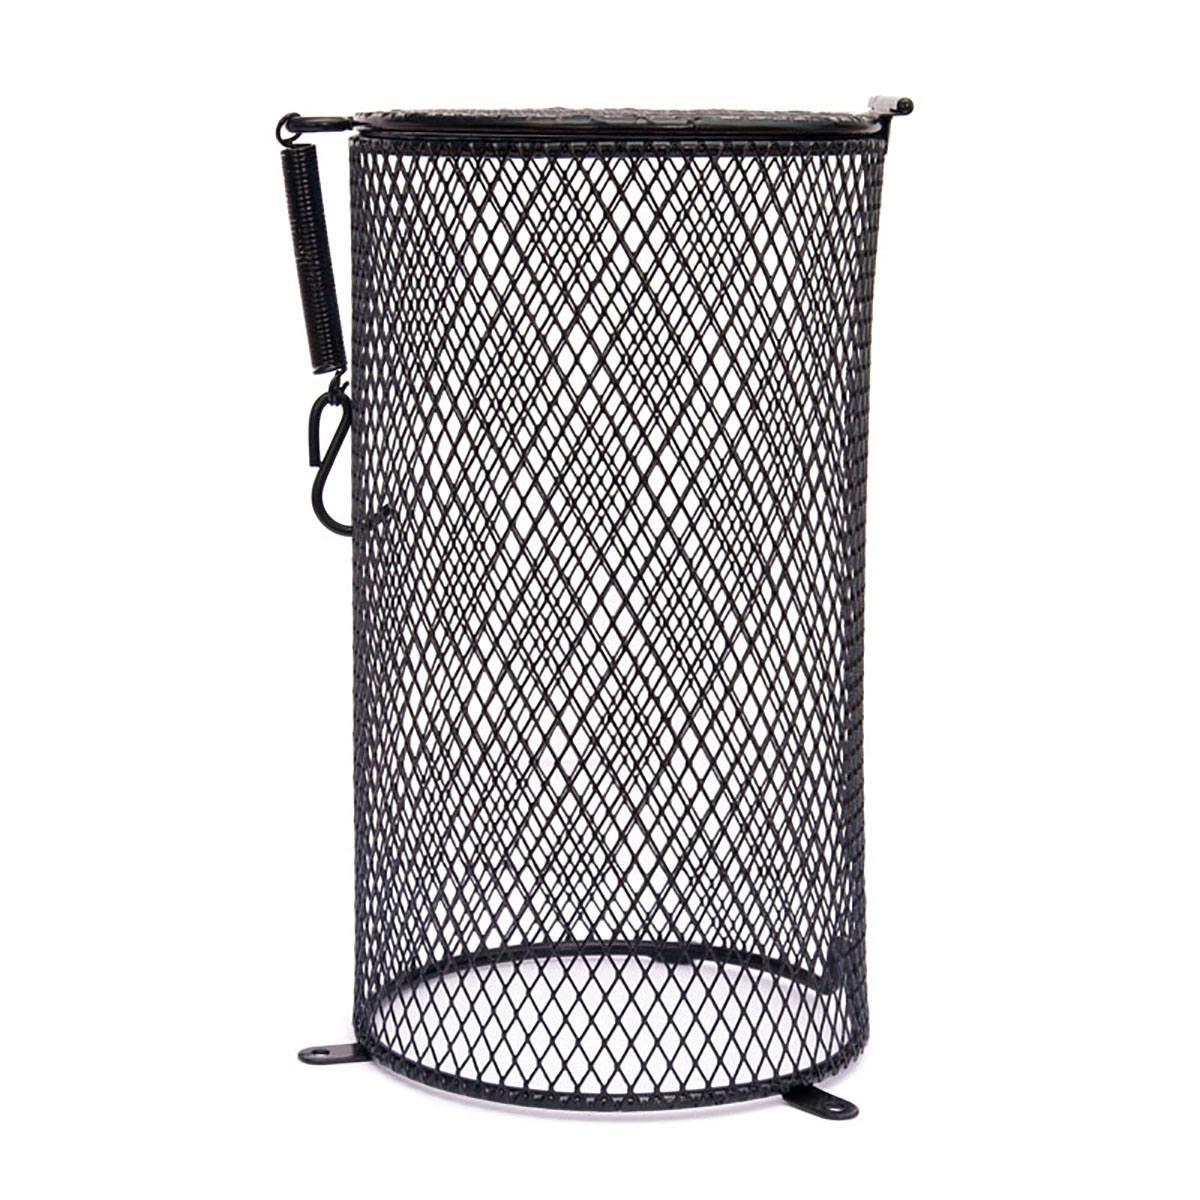 Arcadia Heat Lamp Cage Ceramic Heat Bulb Safety Guard